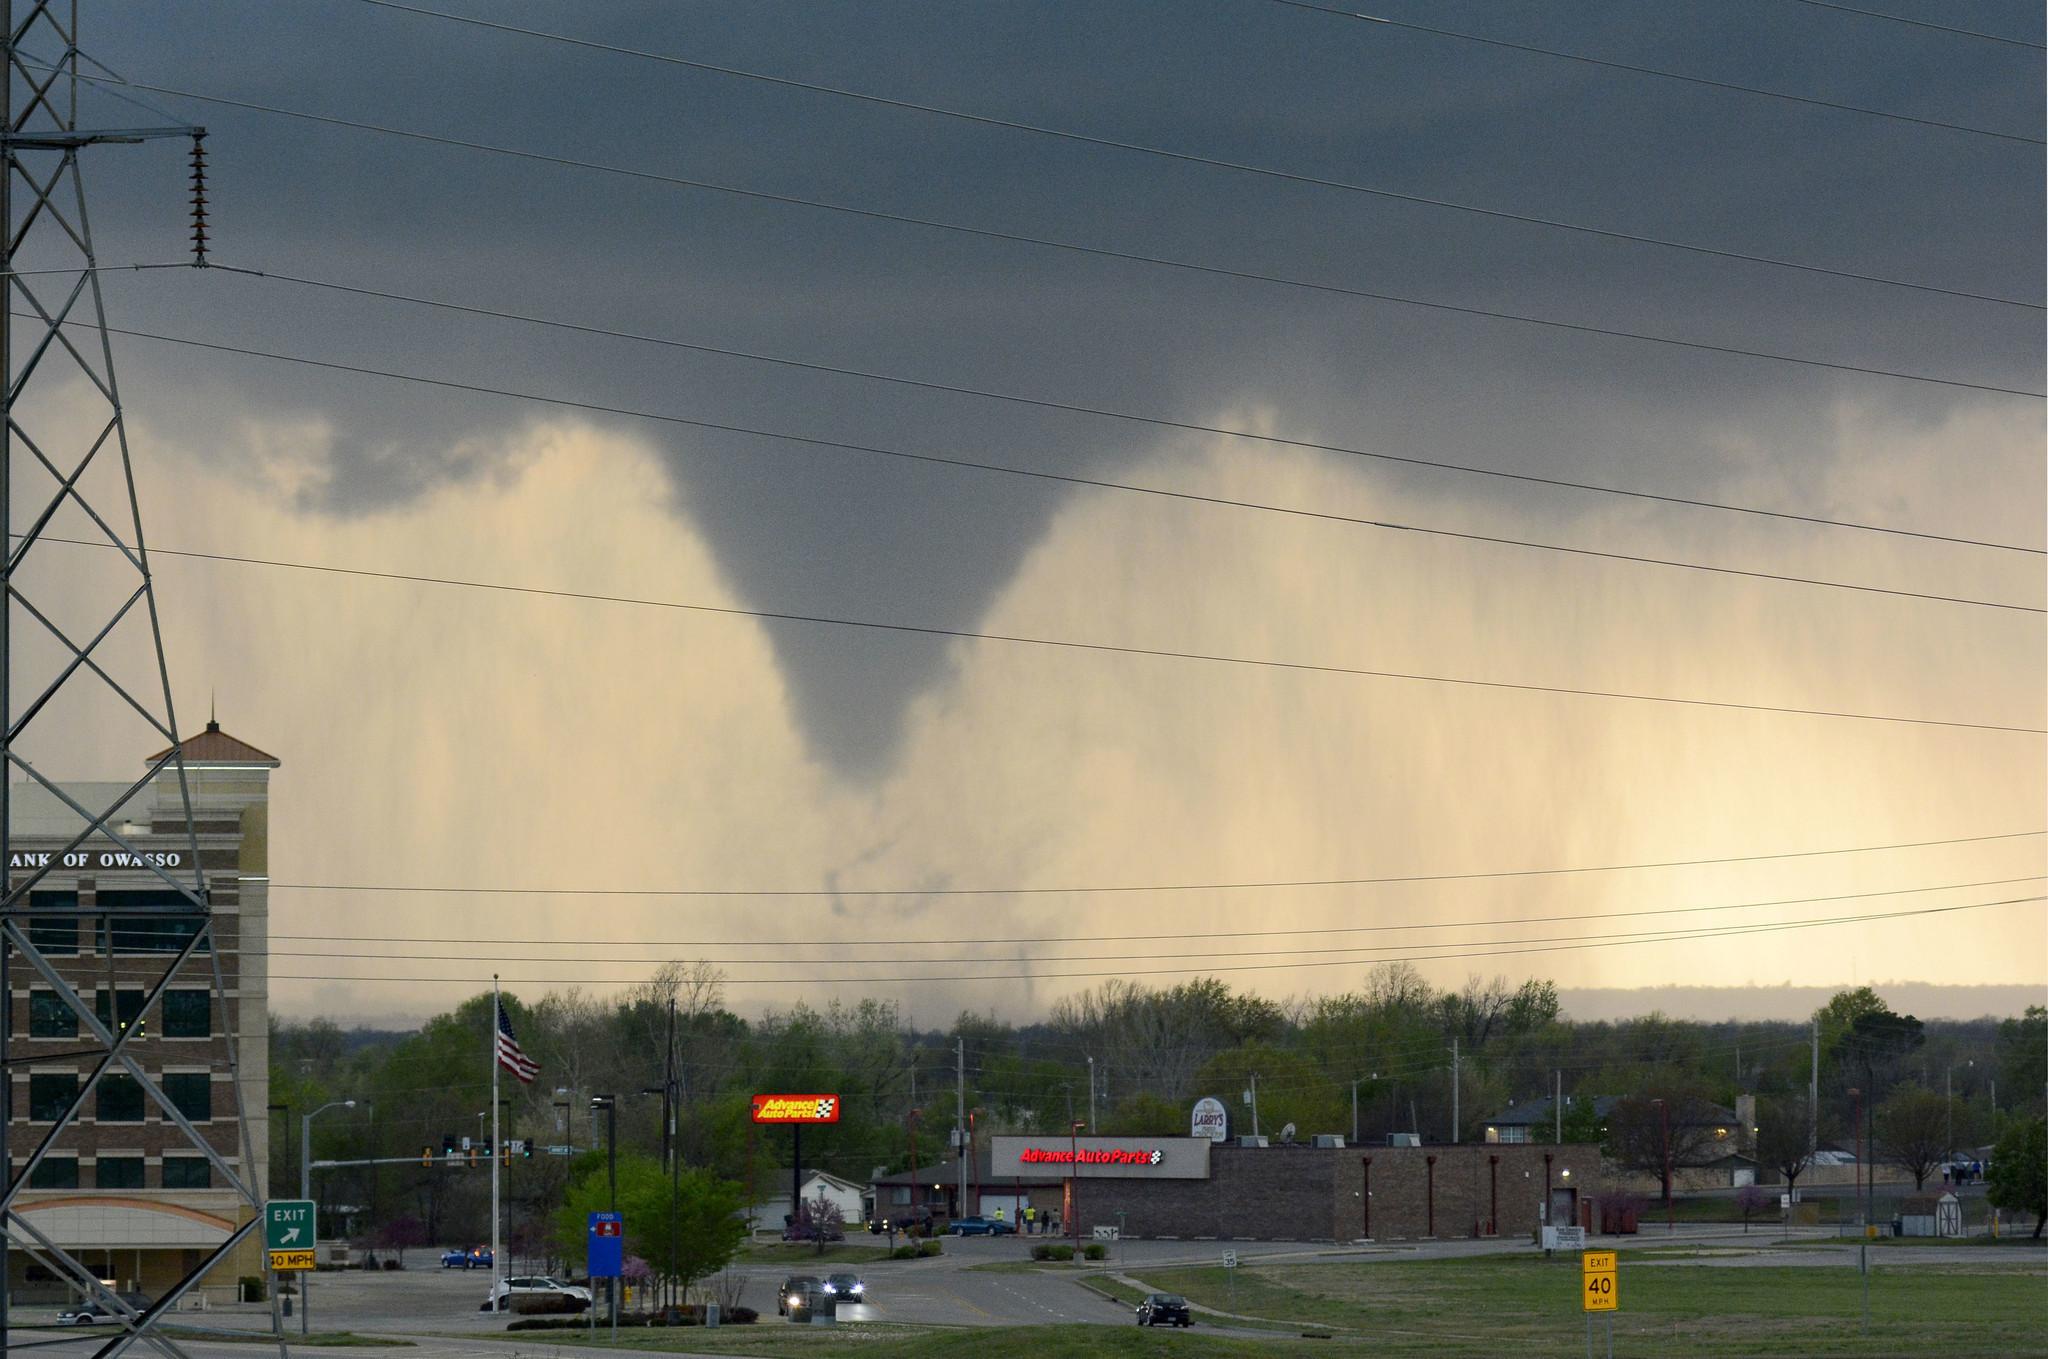 7 Hurt Homes Businesses Damaged After Tornado In